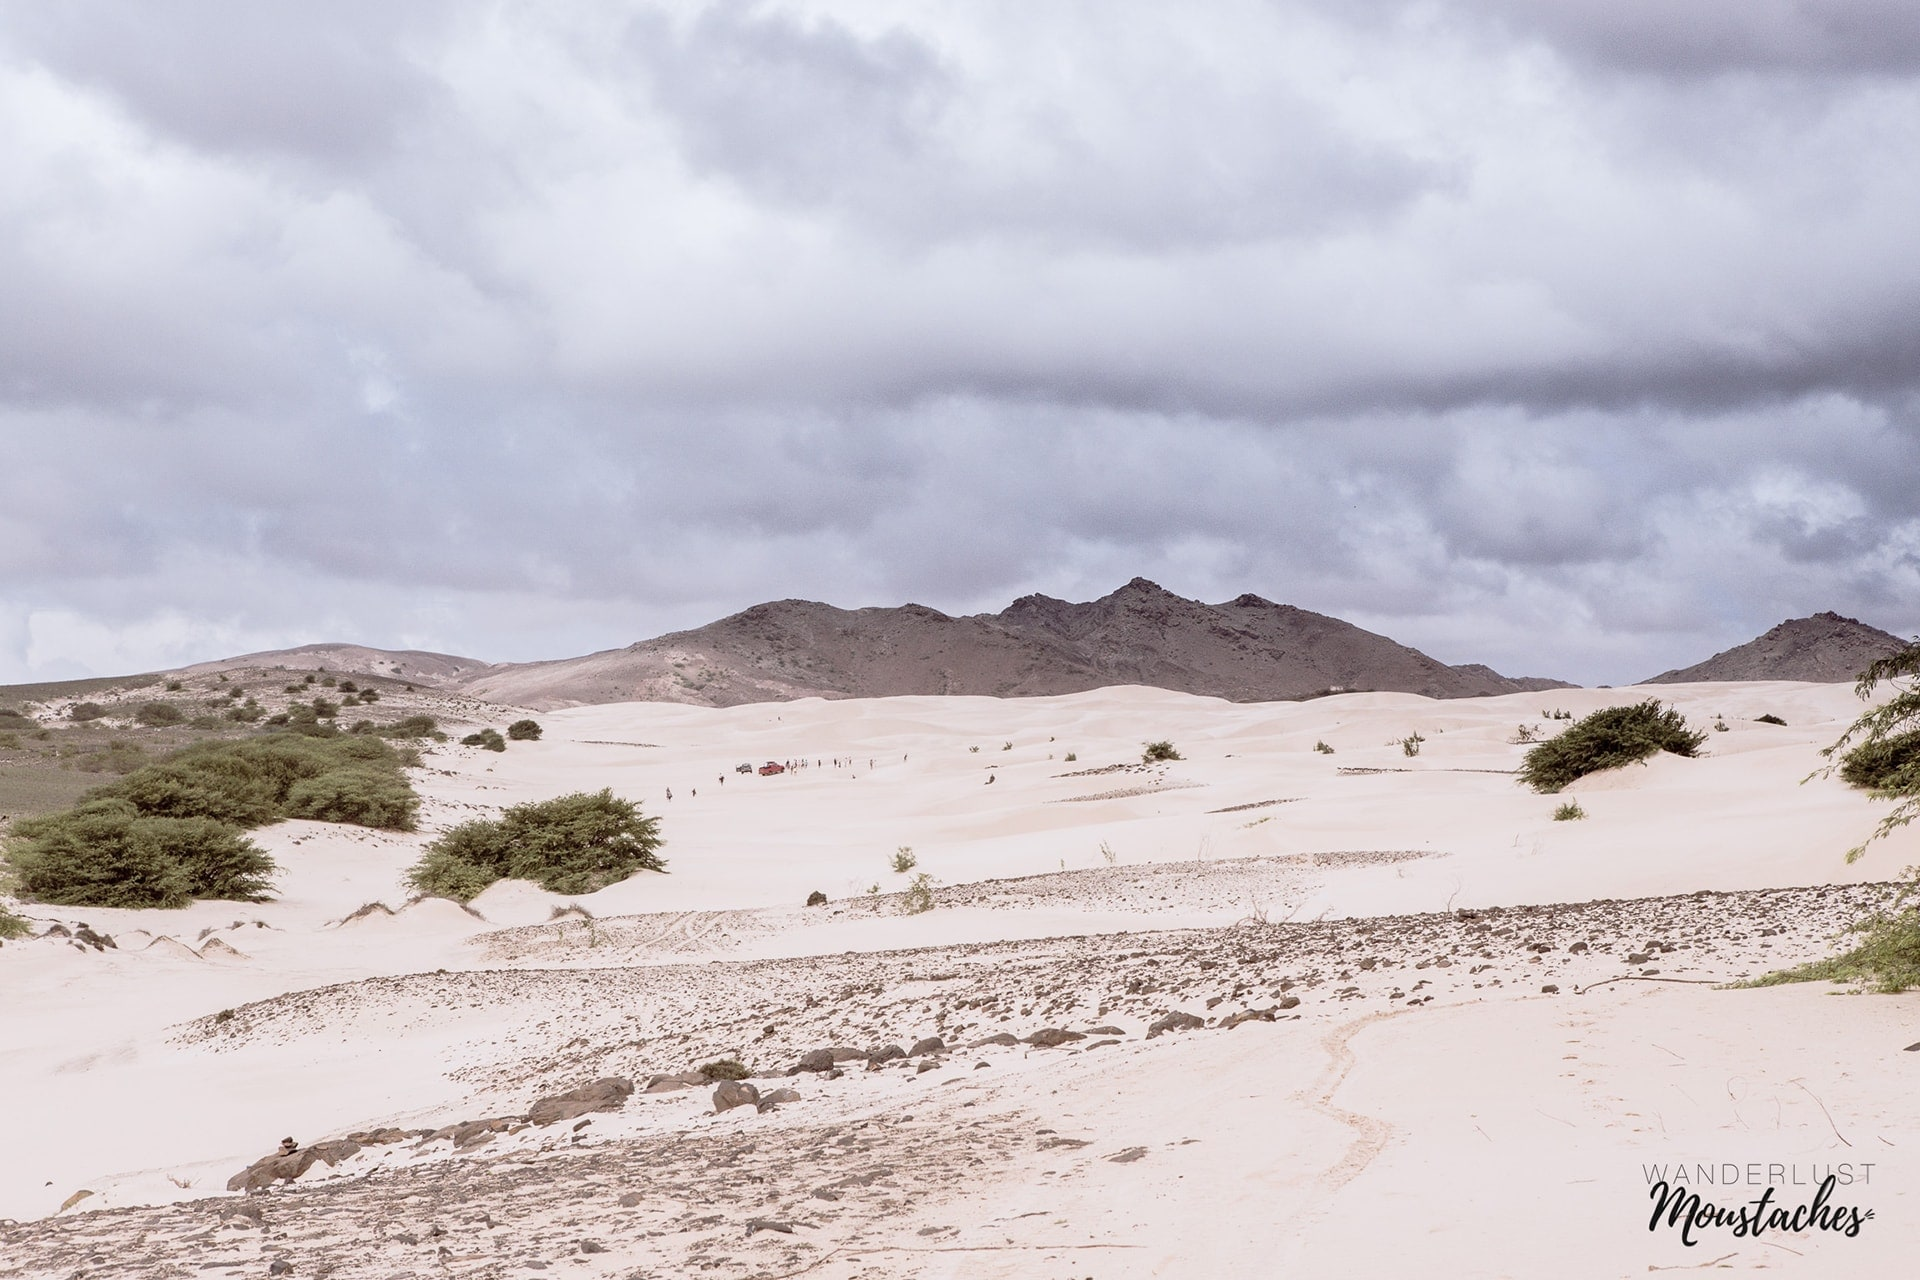 voyage-photo-moustachesenvadrouille-sabine-kley-cabo-verde-deserto-de-viana